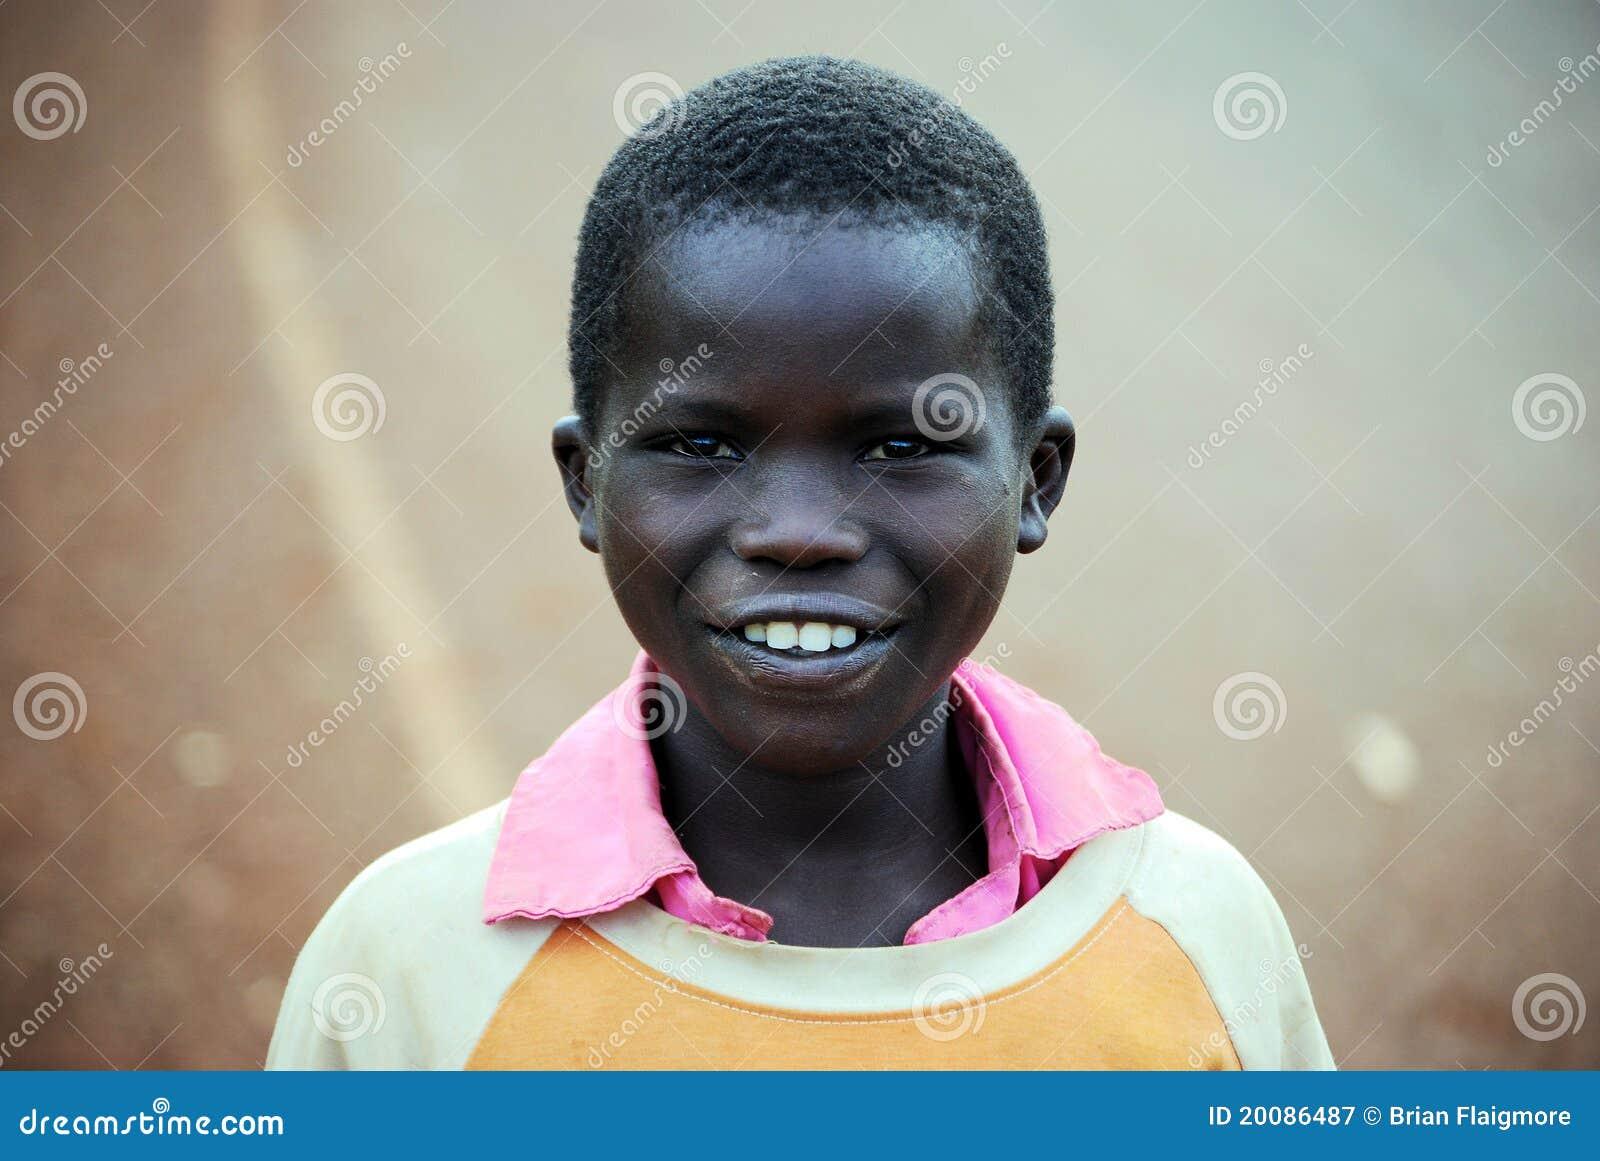 fotos de putas de 18 africano